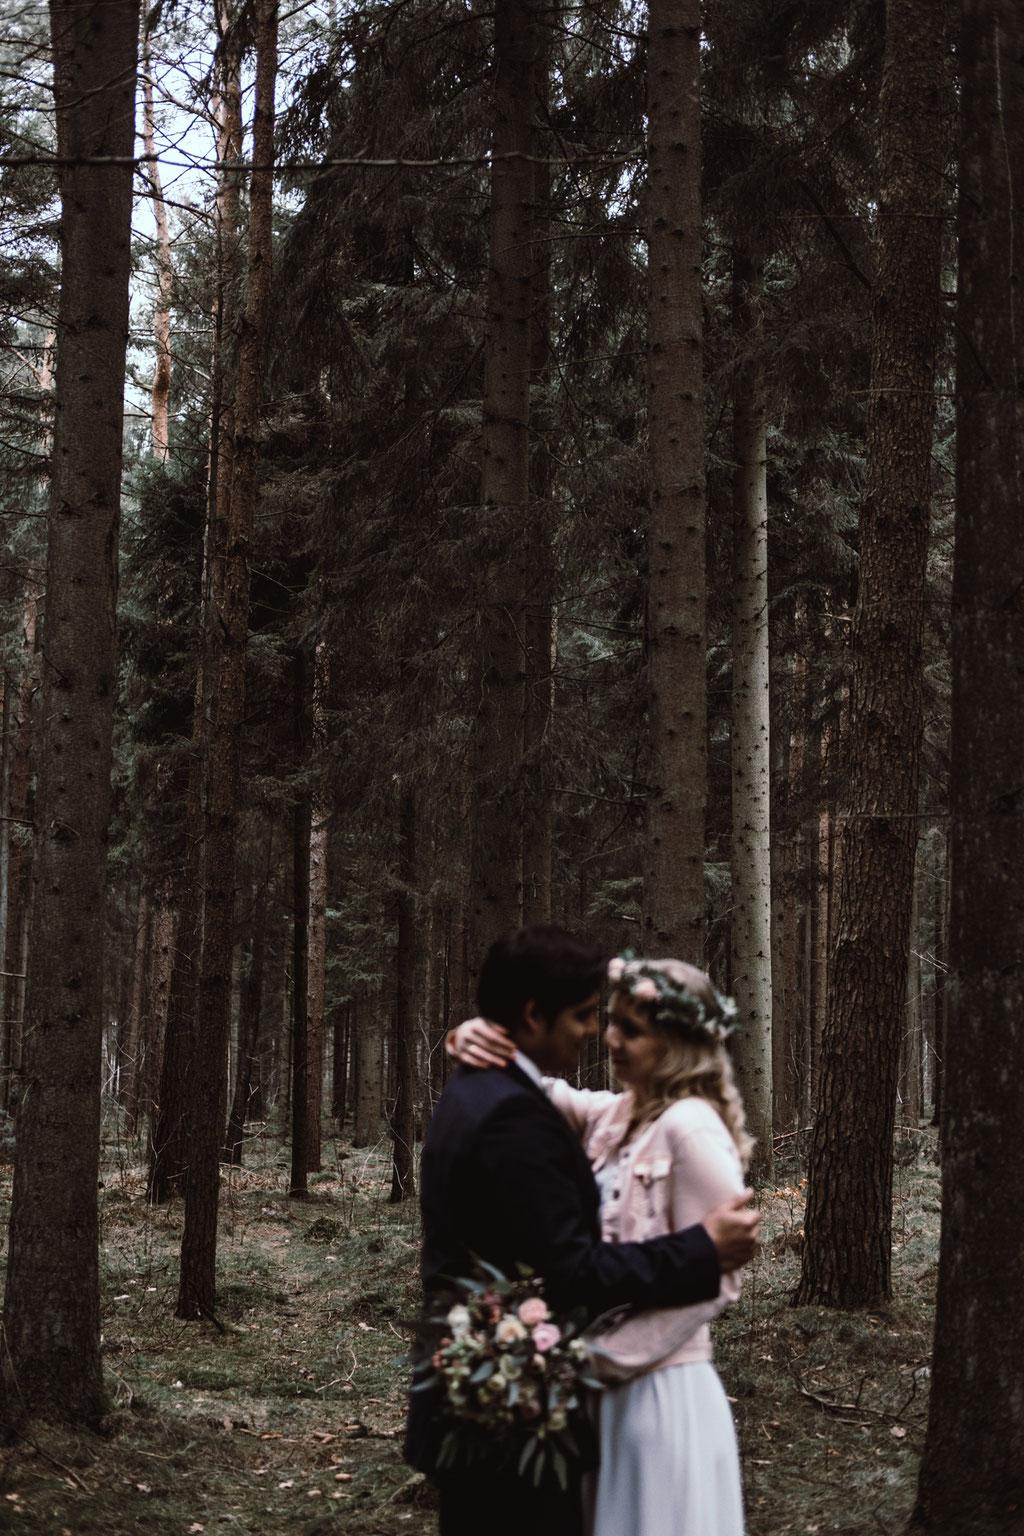 Brautpaar umarmt sich unschärfe